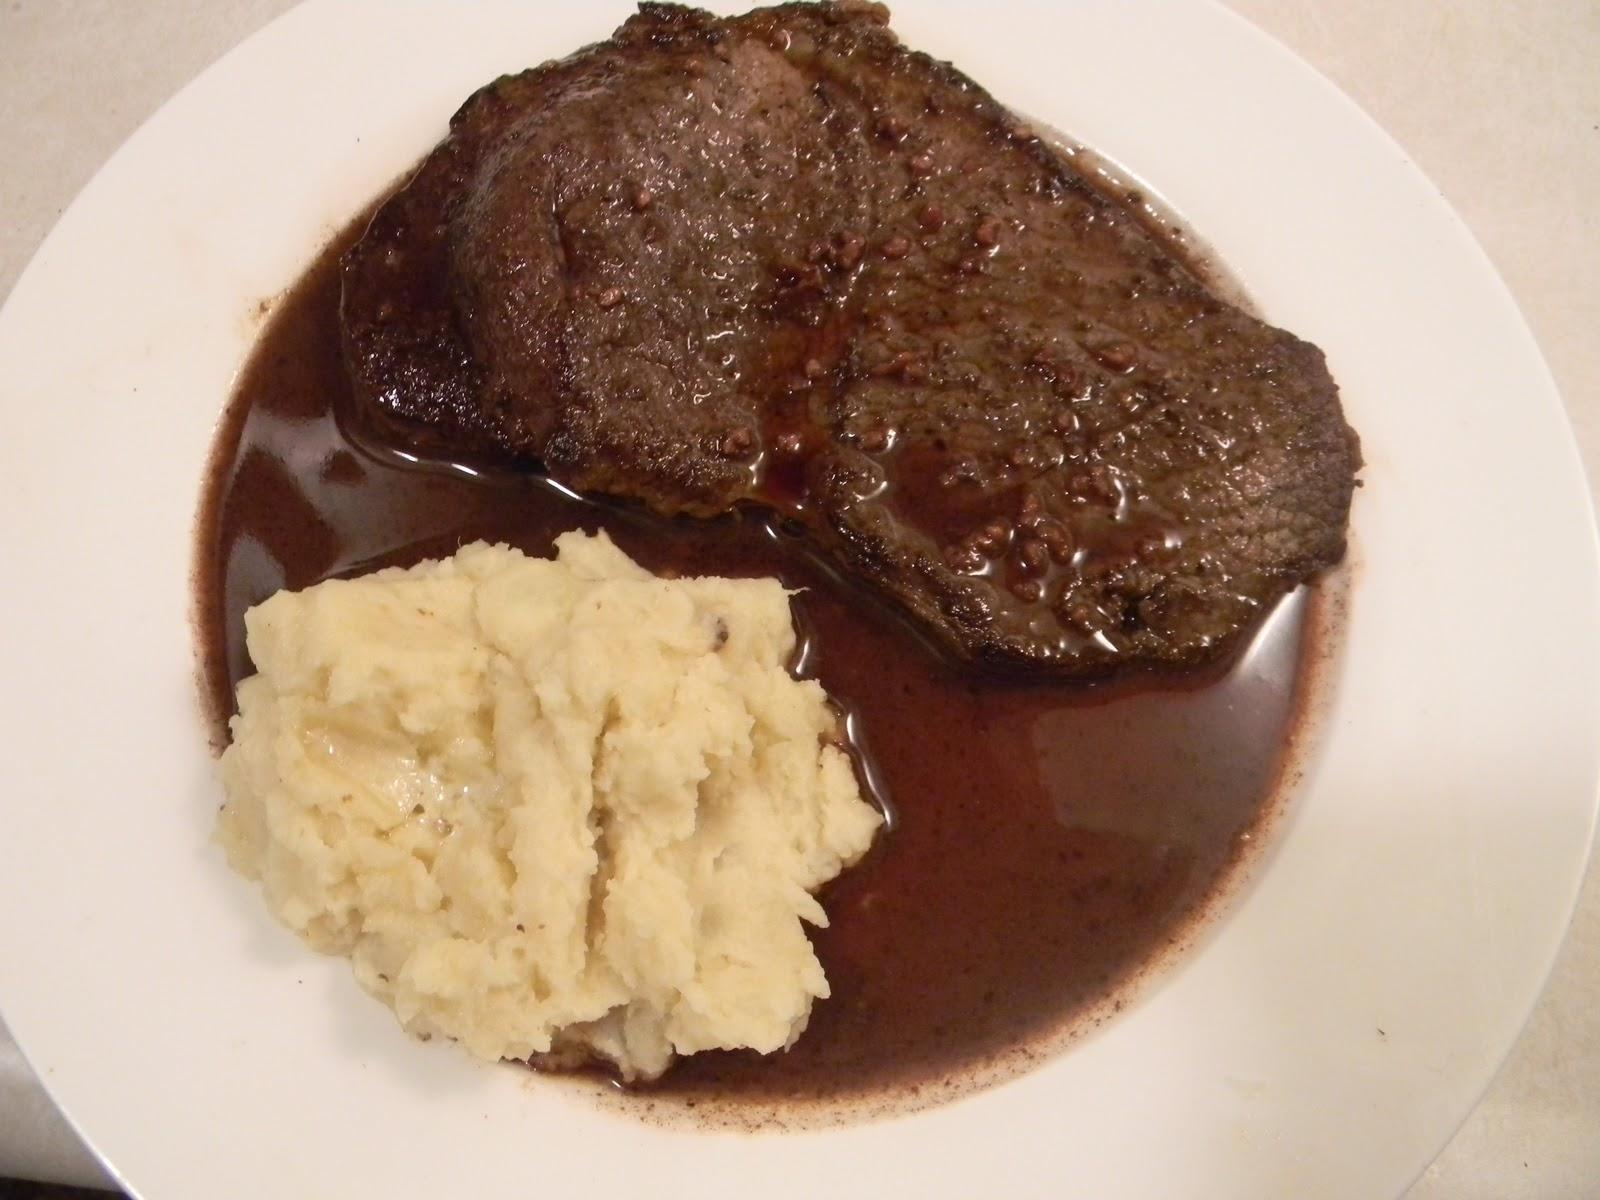 My Cooking Love Affair: Beef Up: Round Tip Steak in Red ...